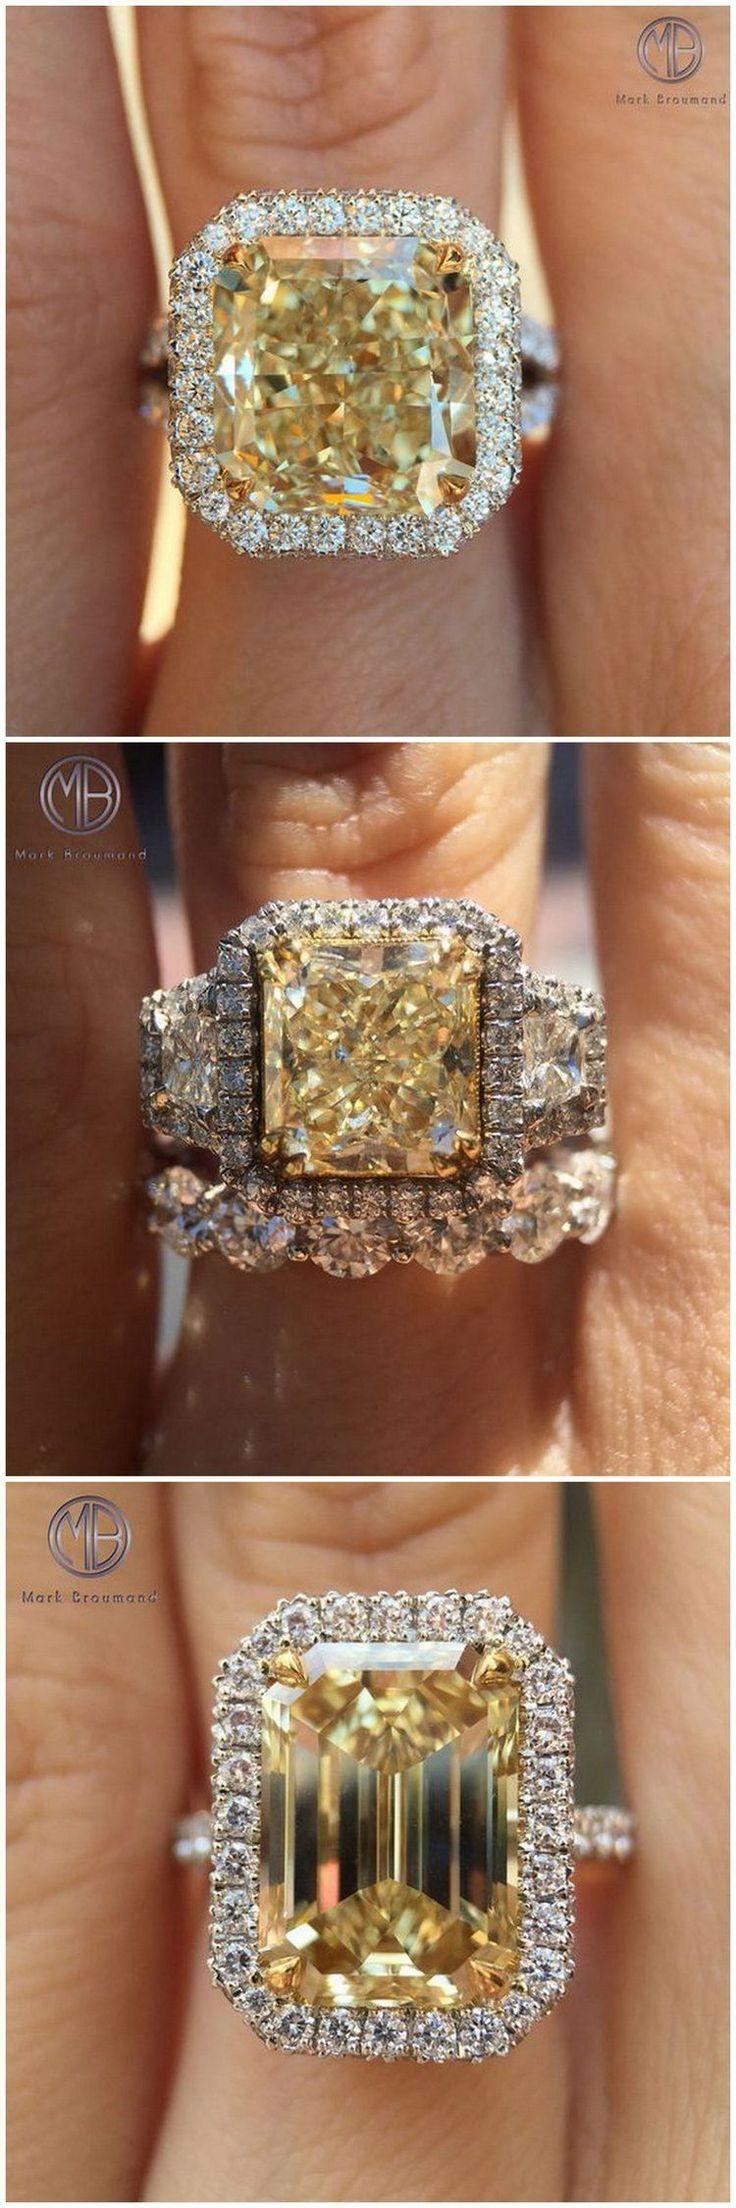 Fancy Yellow Diamond Rings Follow @markbroumand